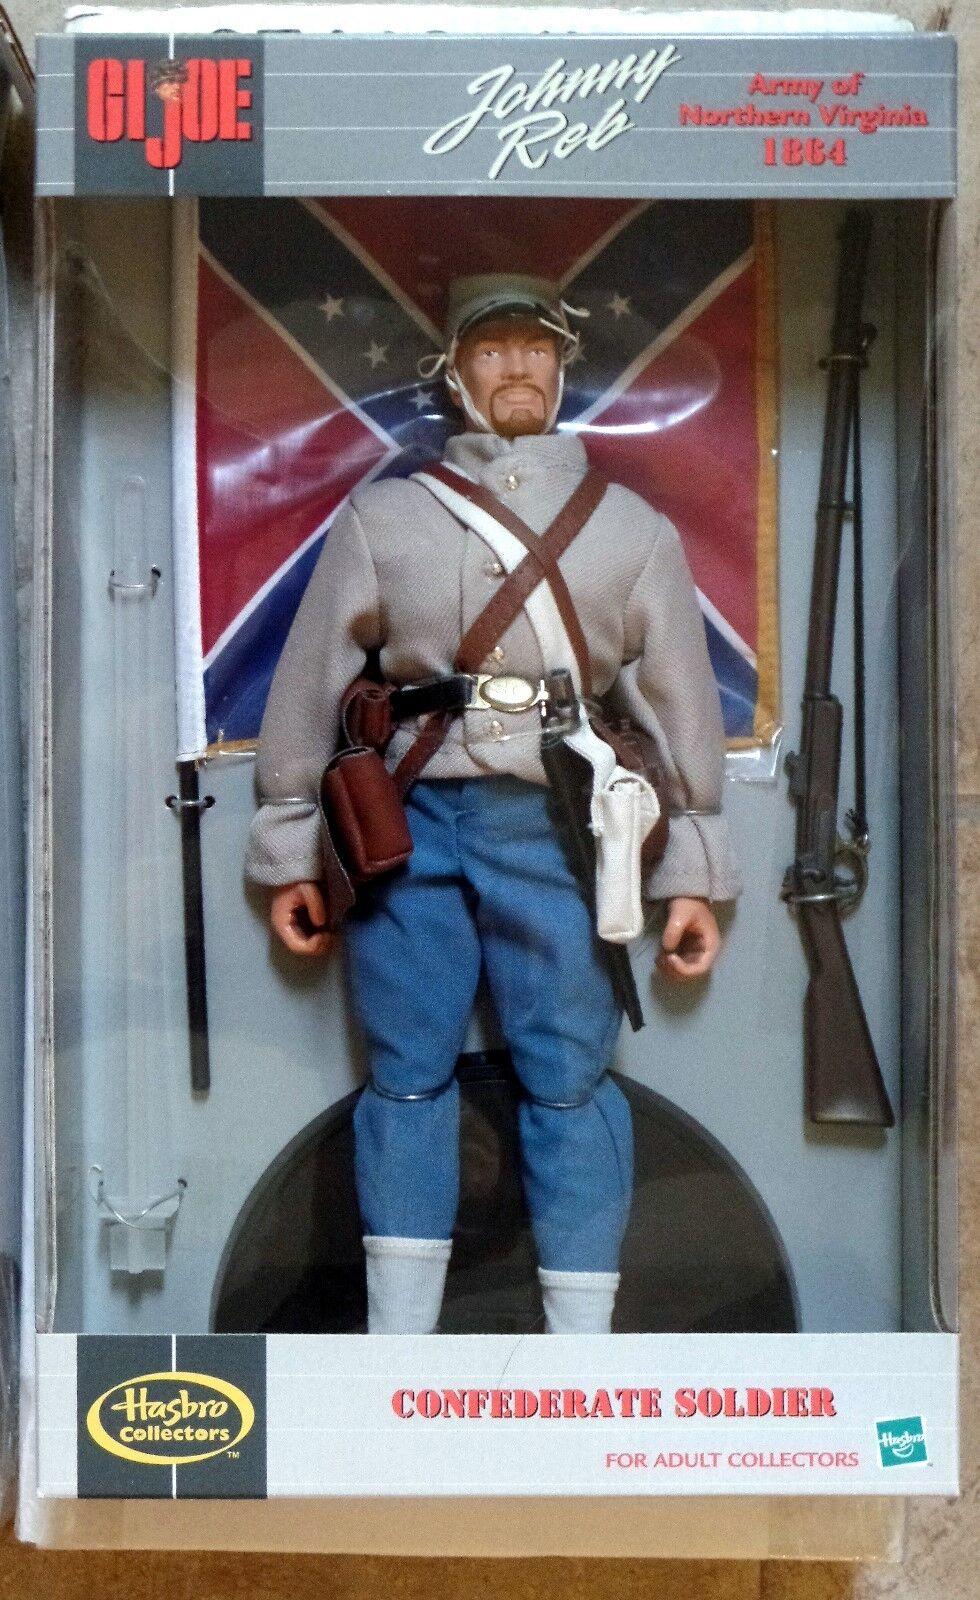 GI Joe Mail-Away 1864 Johnny Reb Confederate Soldier Hasbro